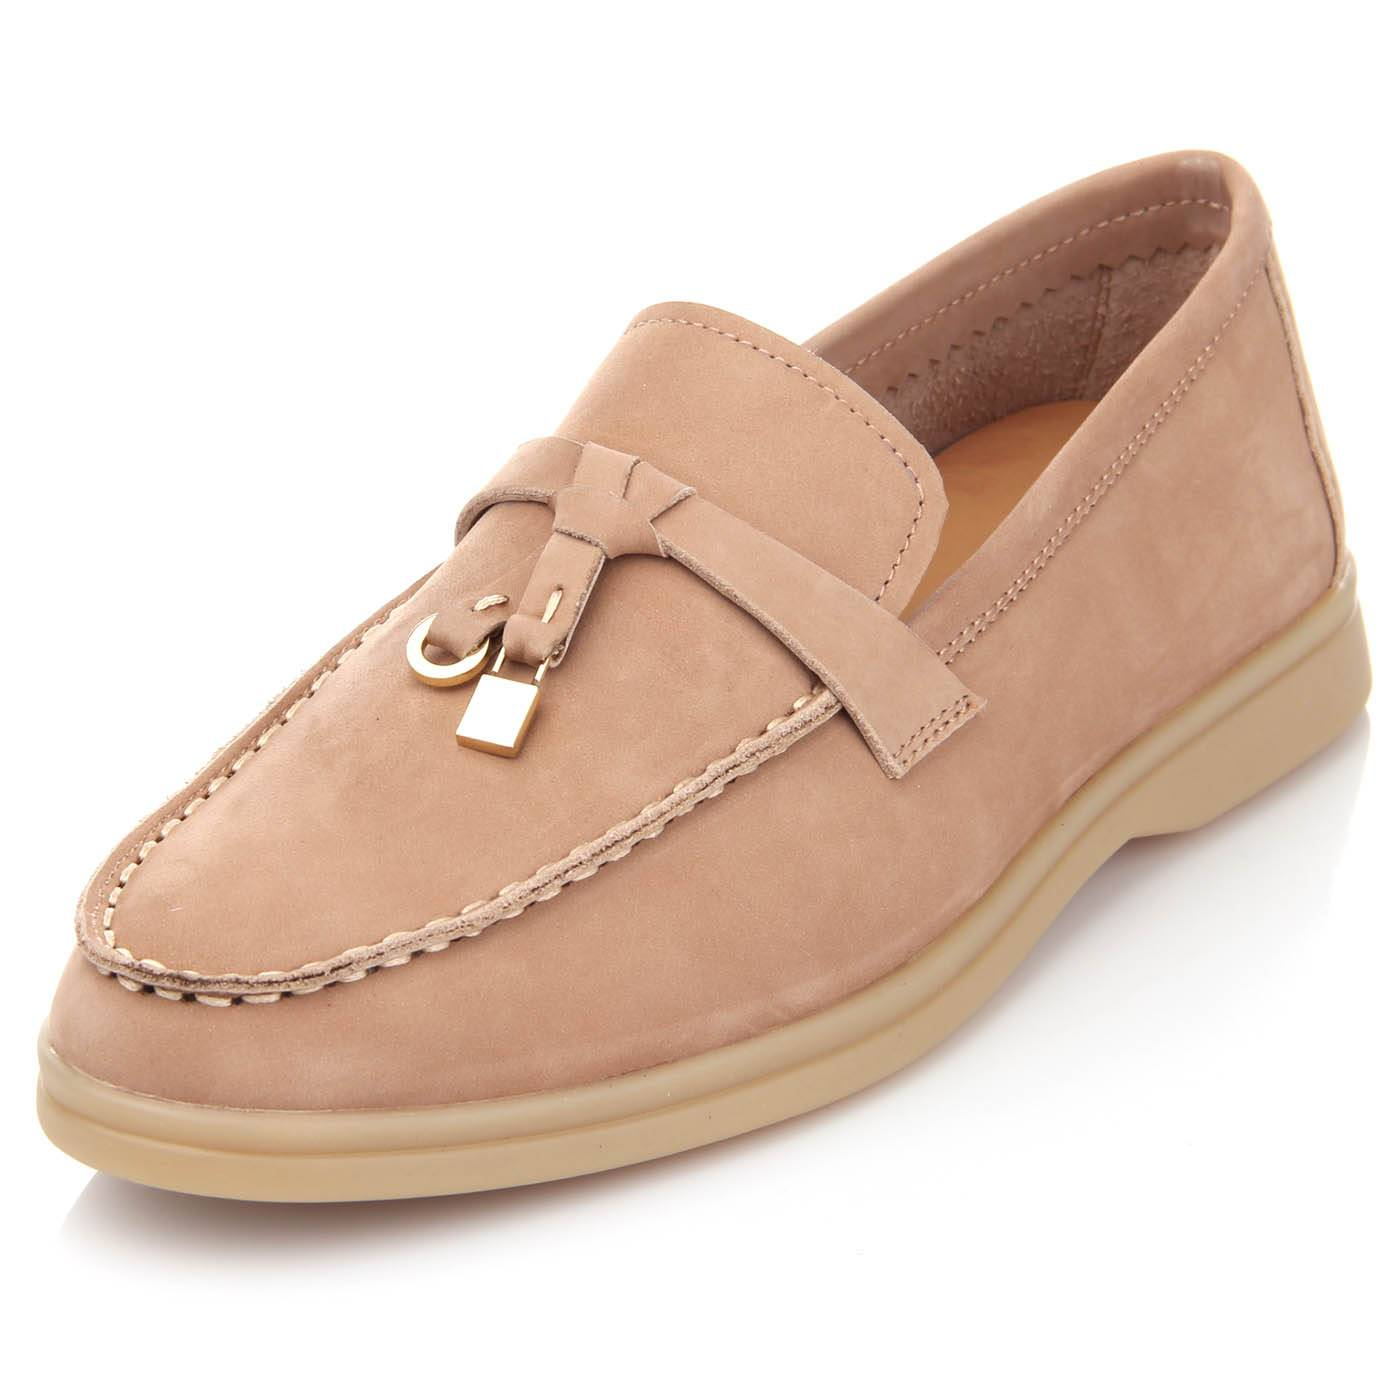 Туфлі жіночі ditto 6350 Бежевий купить по выгодной цене в интернет ... f7e0281408da5